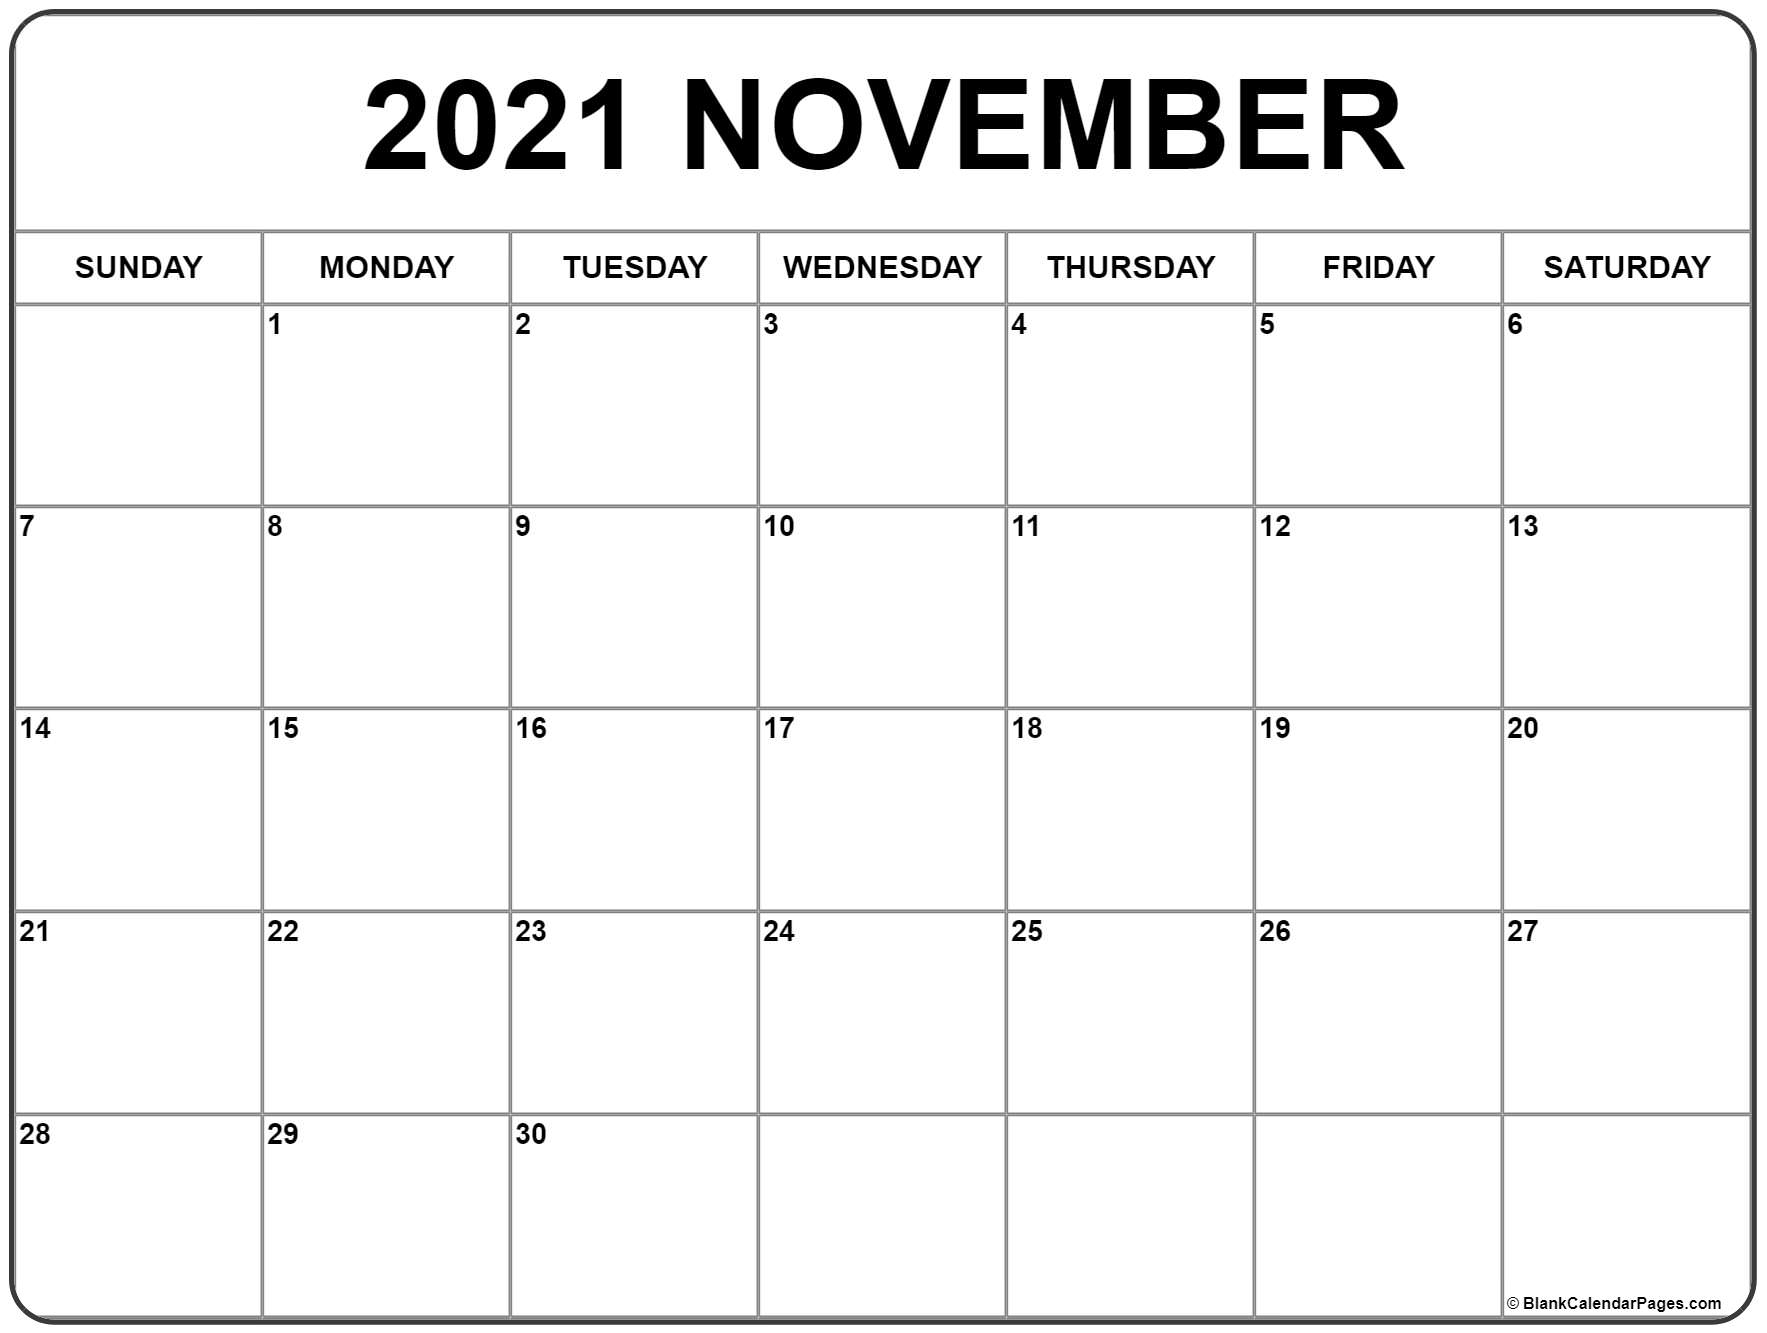 Catch 2021 Calender November